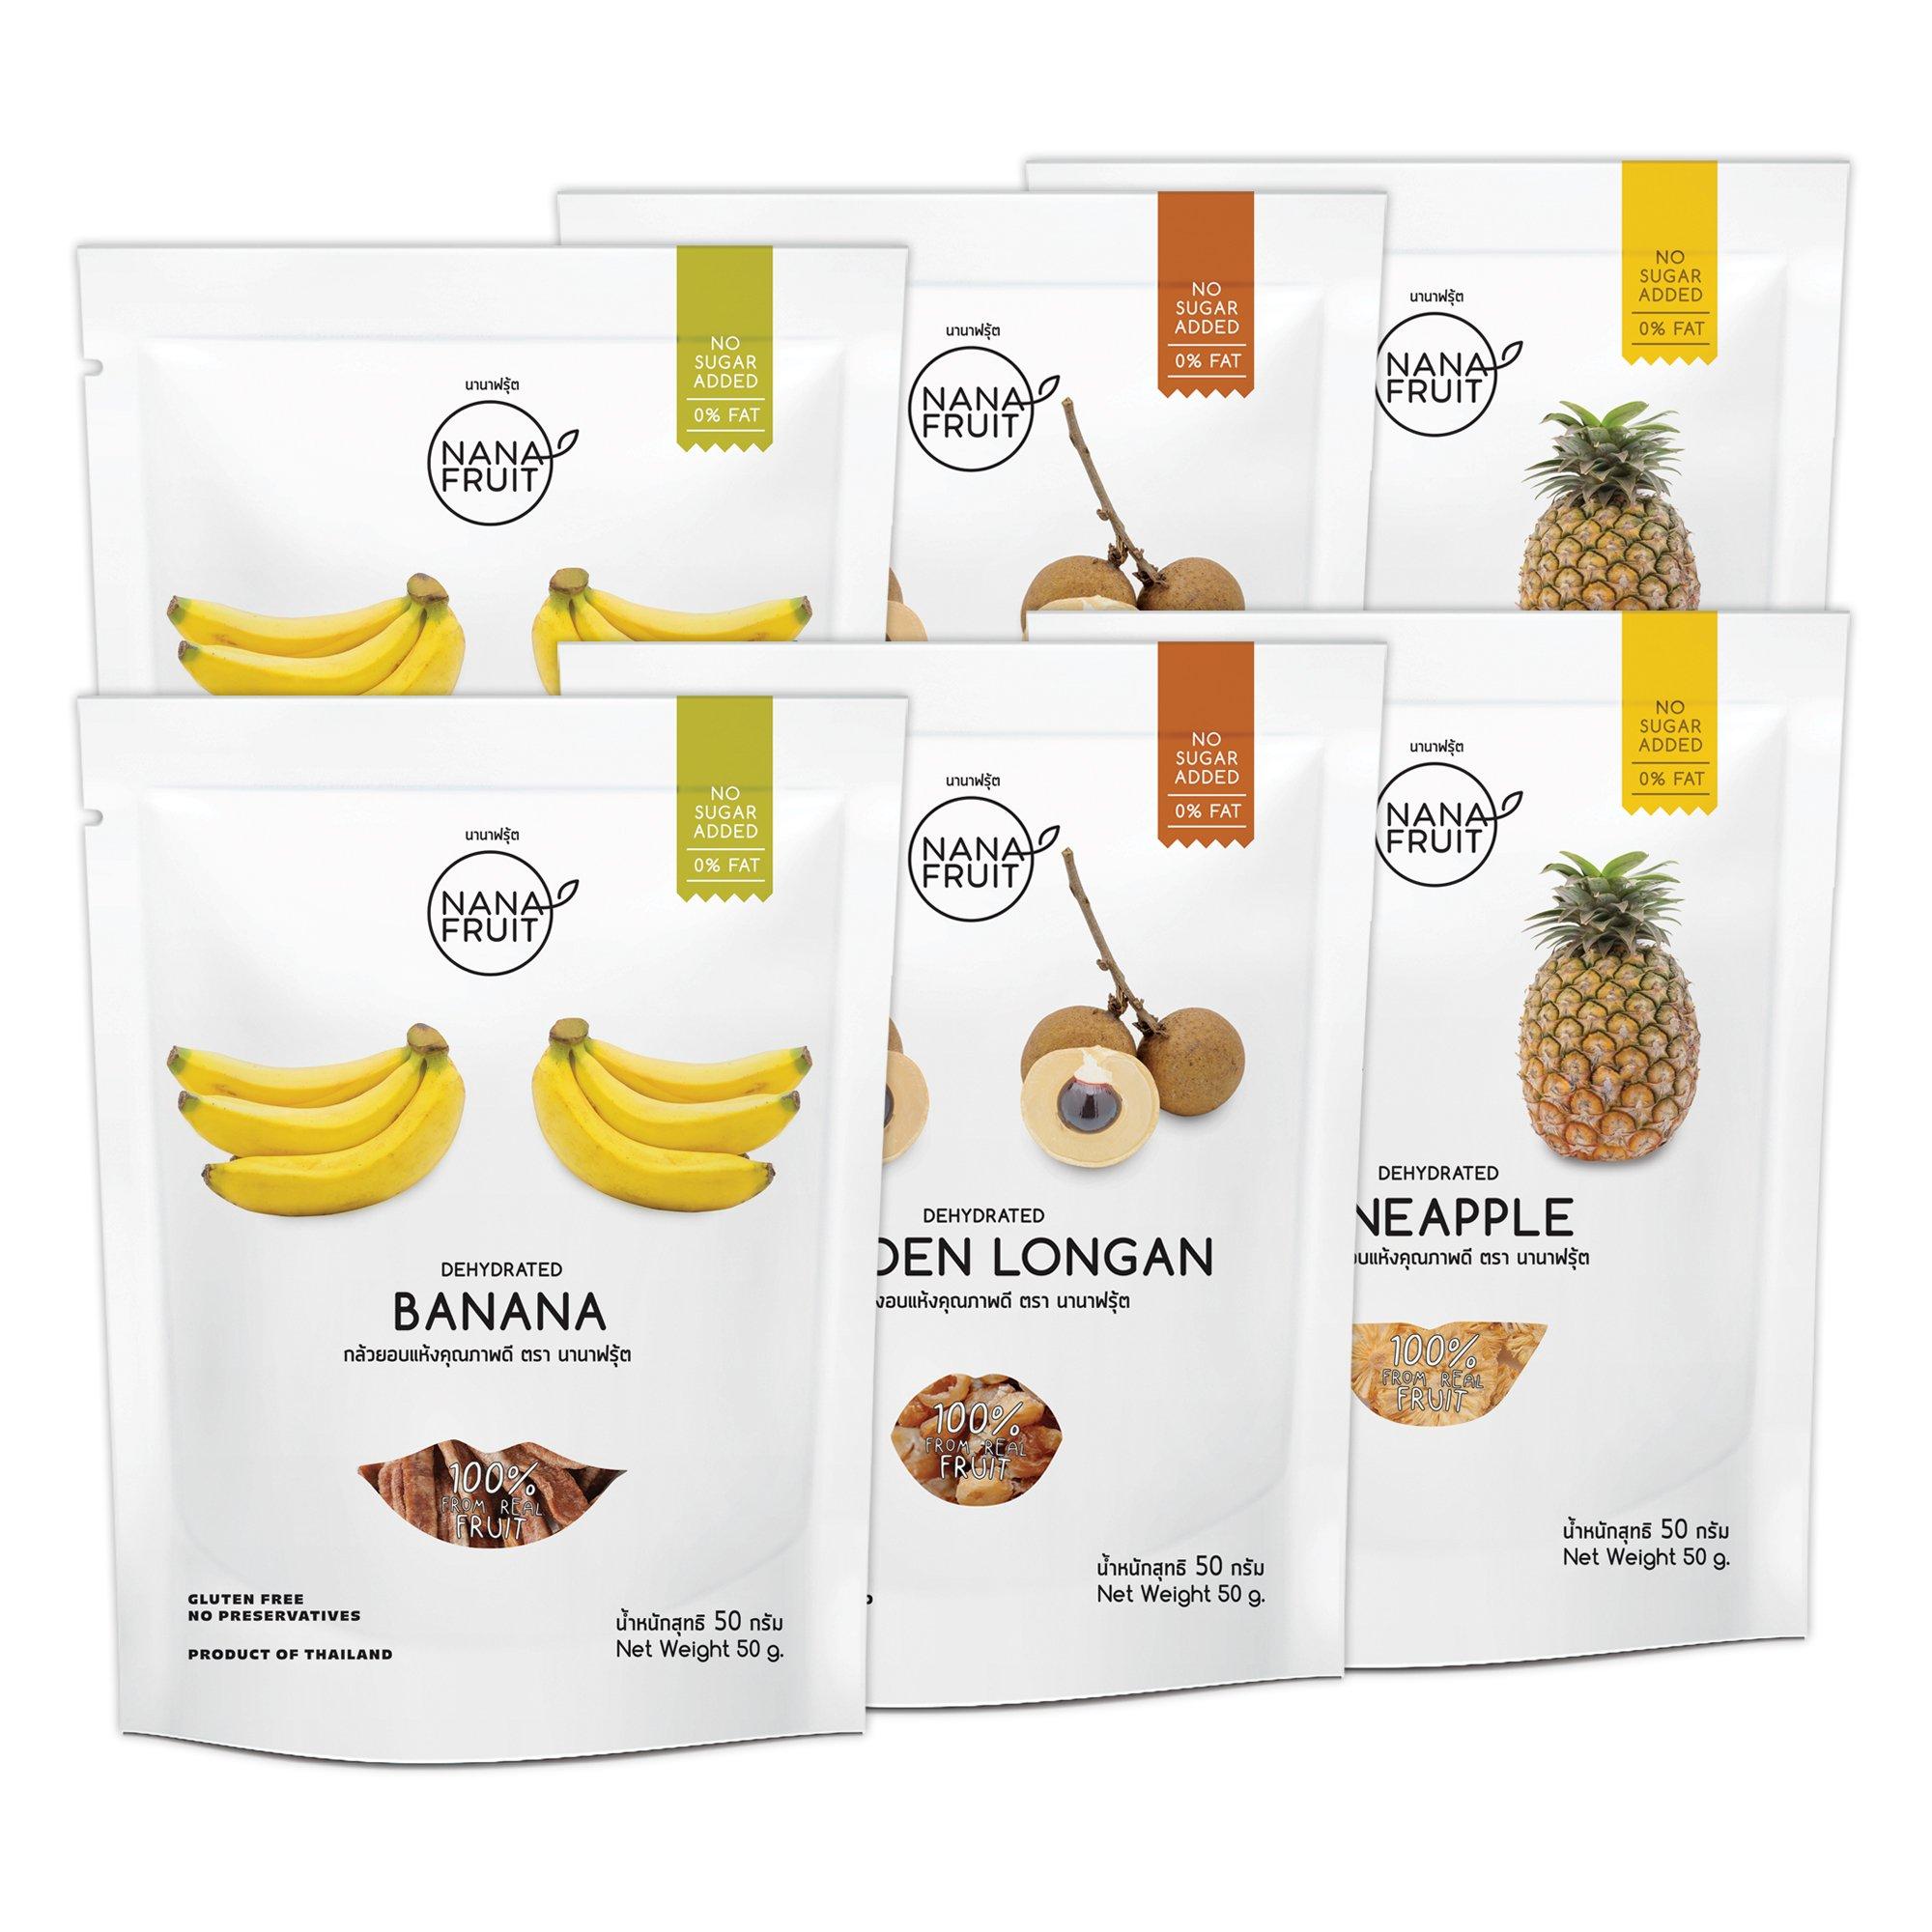 Nana Fruits Dried Banana Pack 50g. (2 Pack) Longan Pack 50g. (2 Pack) and Pineapple Pack 50g. (2 Pack)